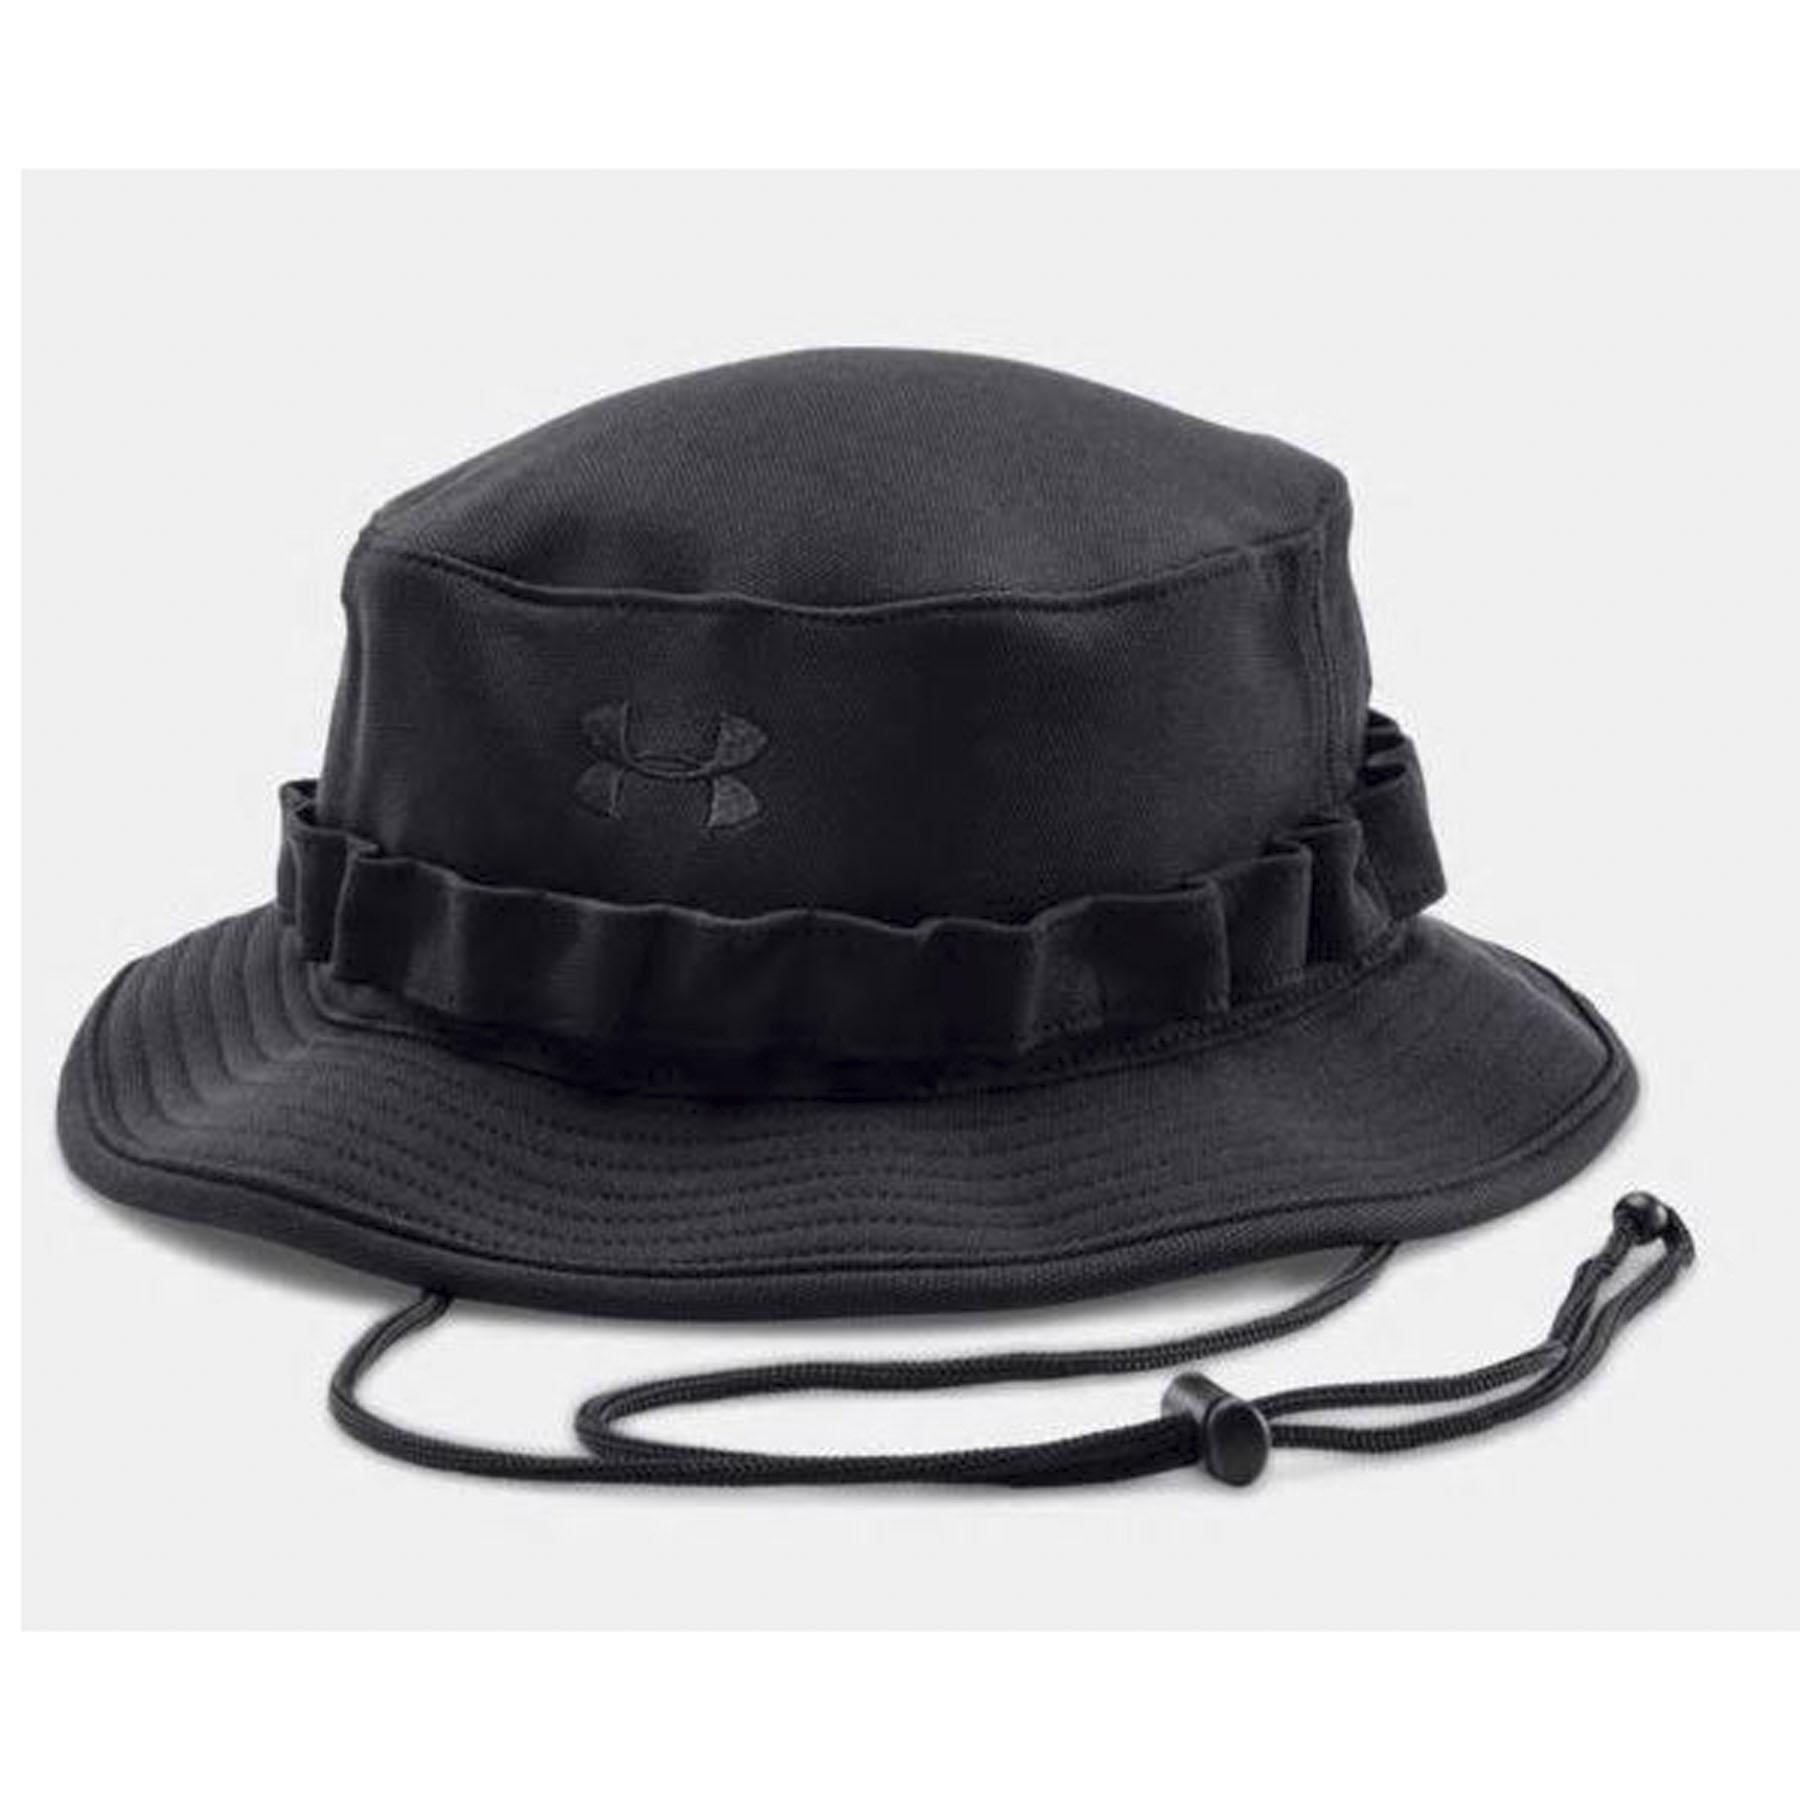 d4de3f89e8600 Under Armour Tactical Bucket Hat